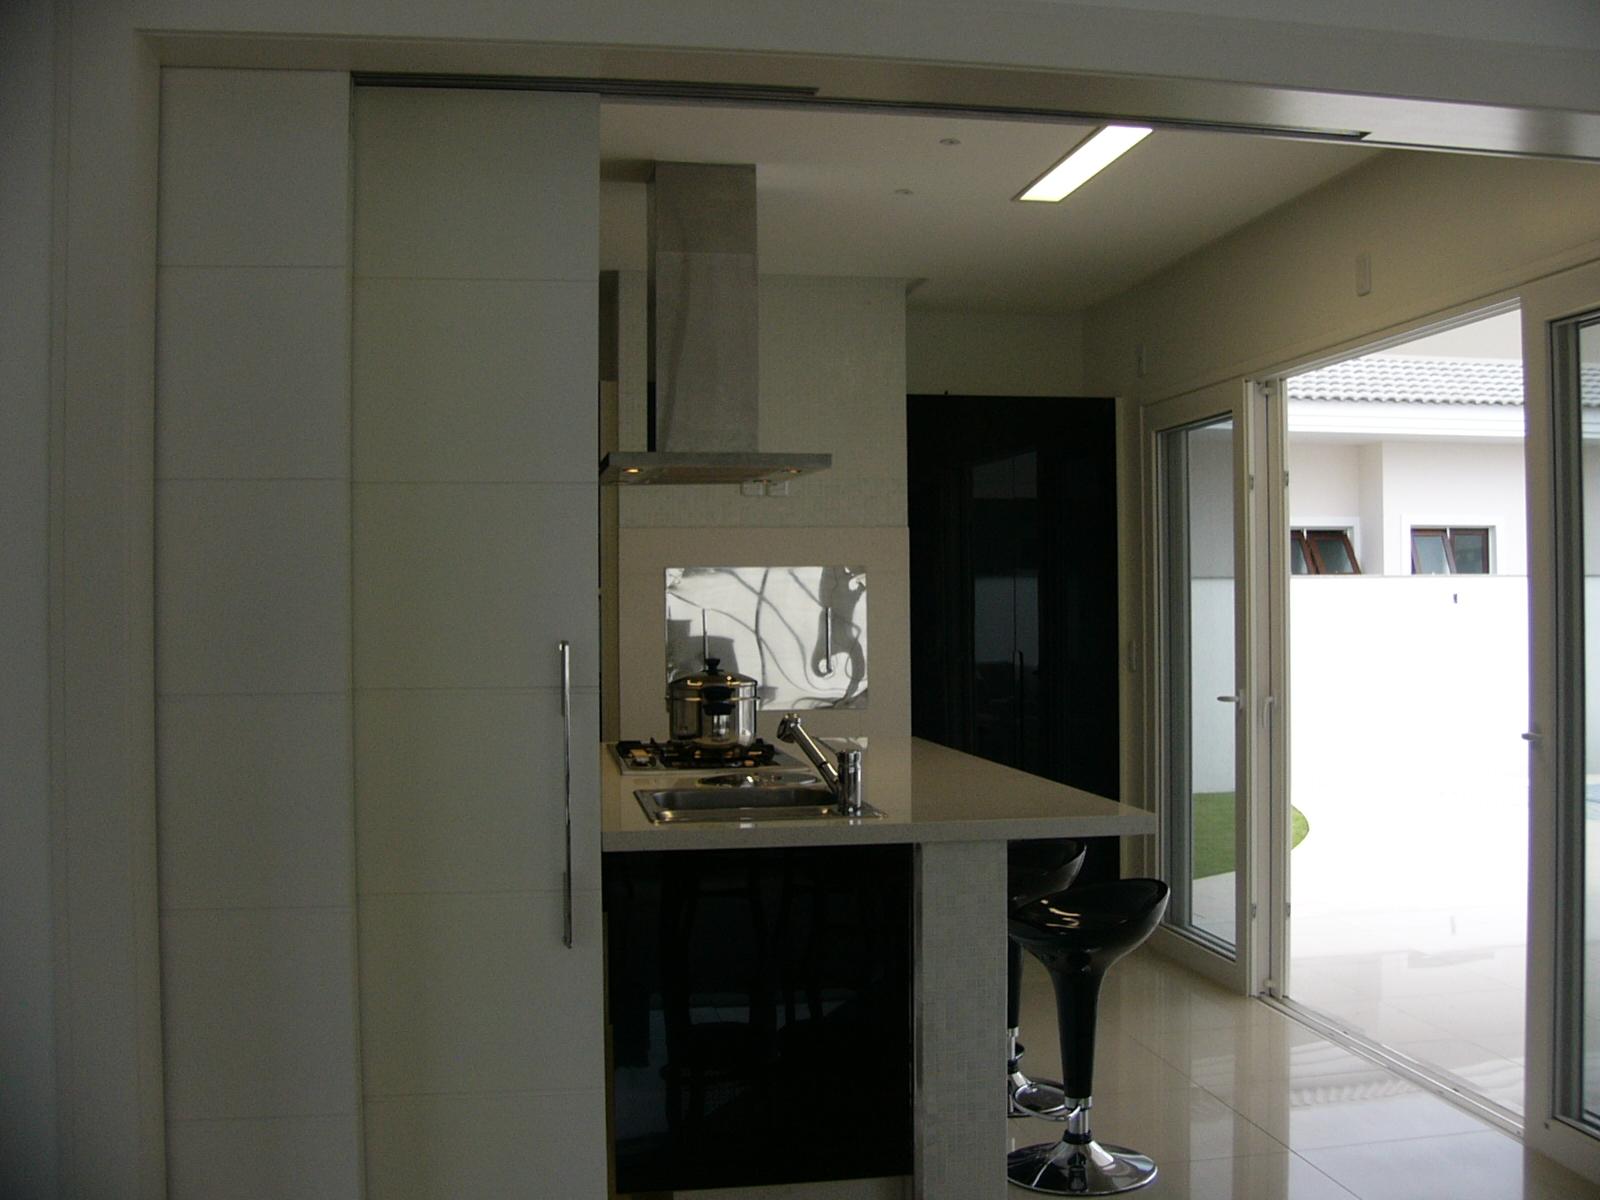 Nenhuma janela nesta cozinha . Invés disto uma ampla porta janela  #575343 1600 1200